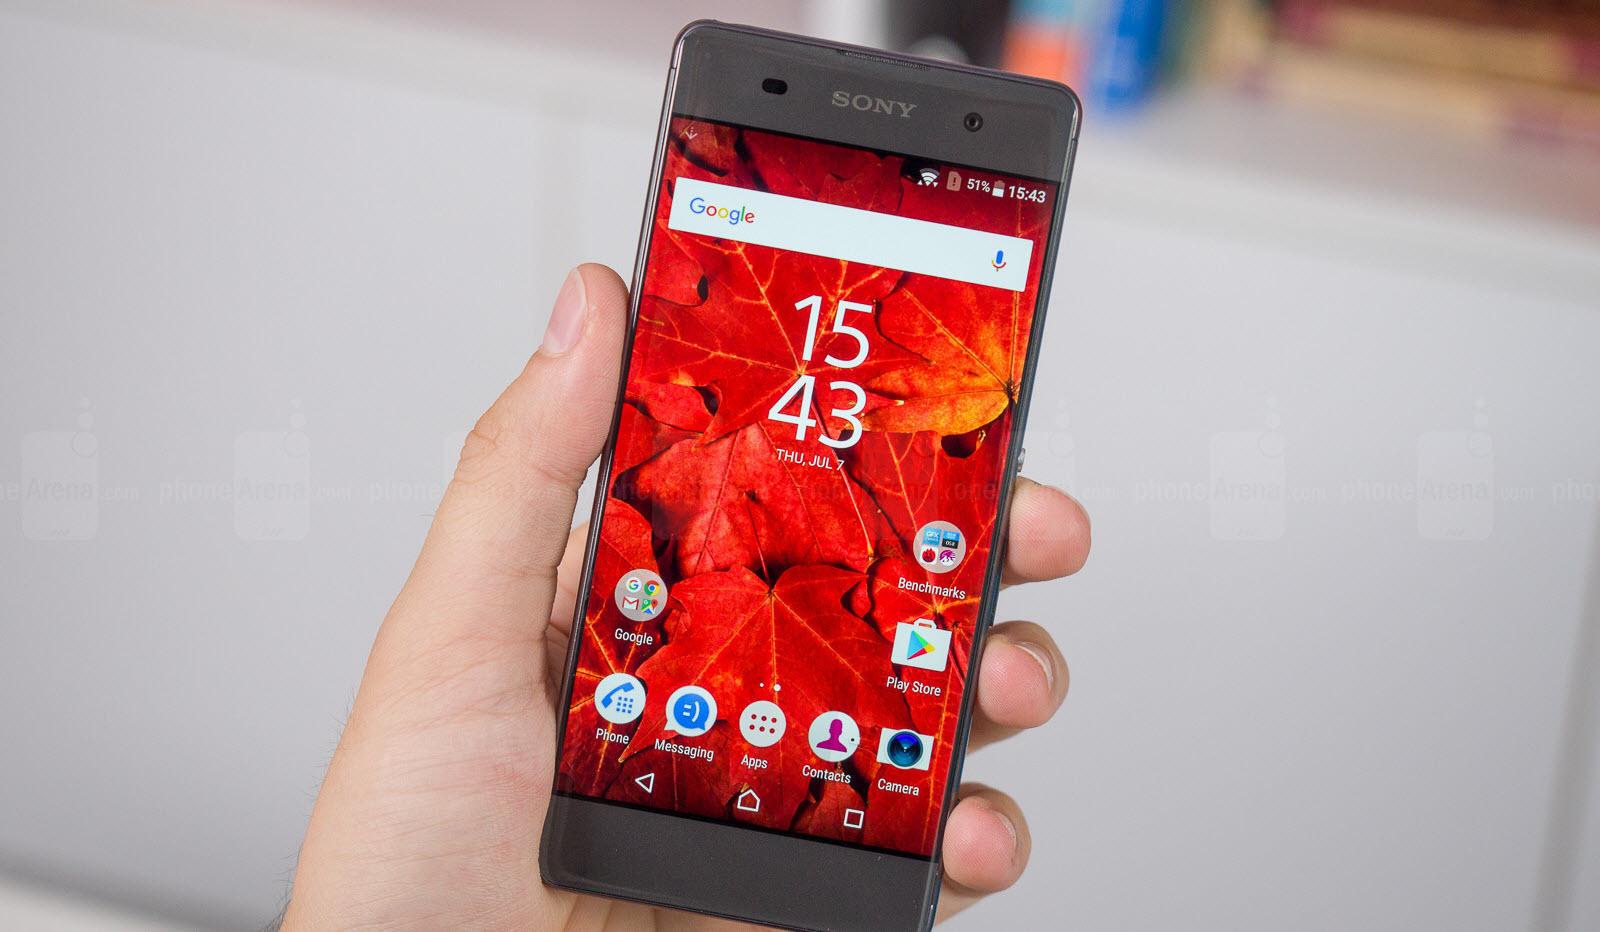 Sony Xperia XA Unlock Tool - Remove android phone password